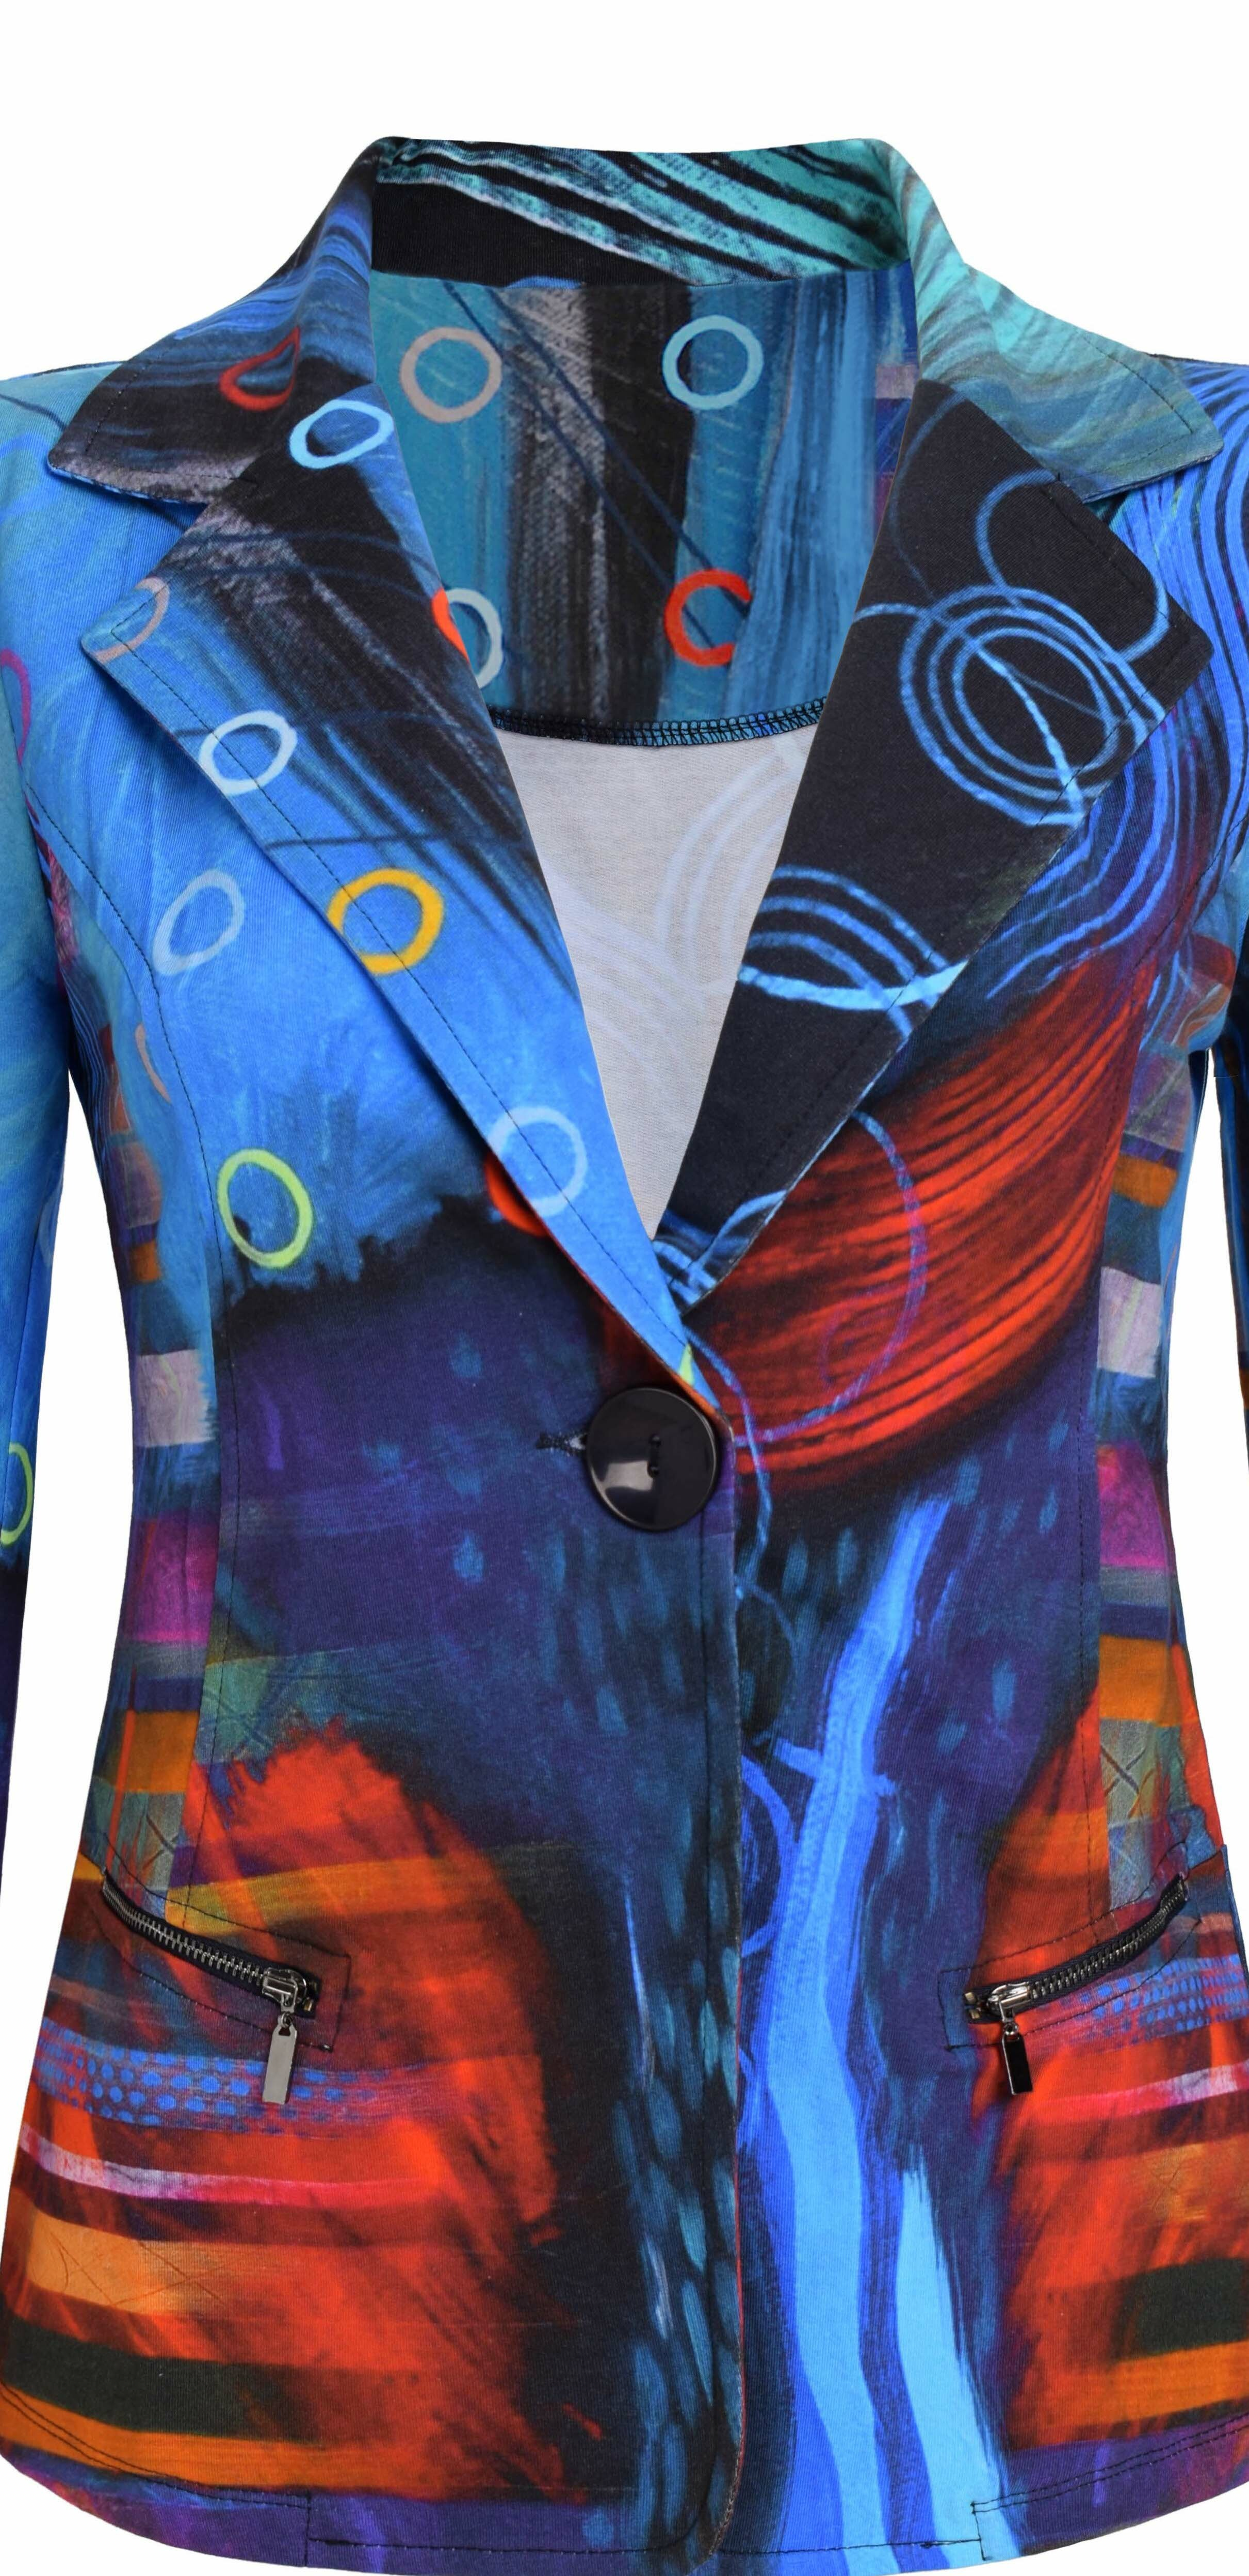 Simply Art Dolcezza: Distilling Colors Of Beauty Zip Pocket Abstract Art Blazer (1 Left!)